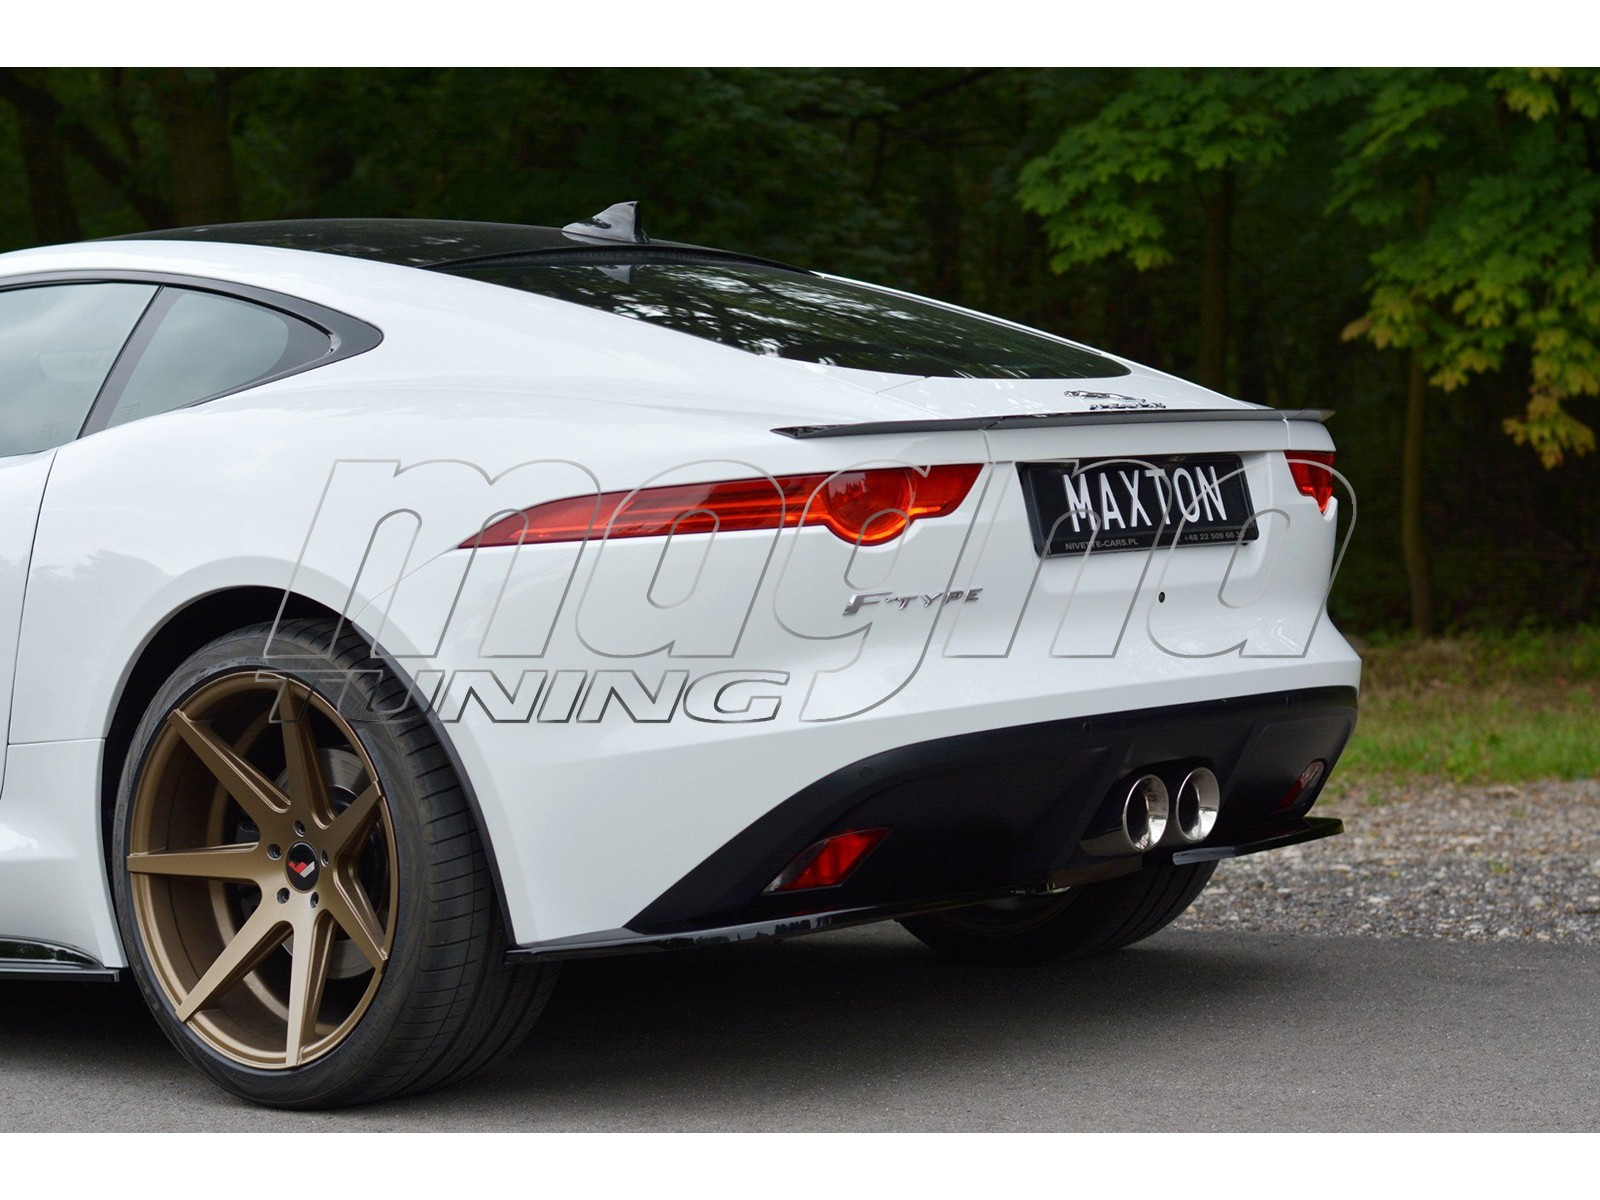 Jaguar F-Type MX Rear Wing Extension